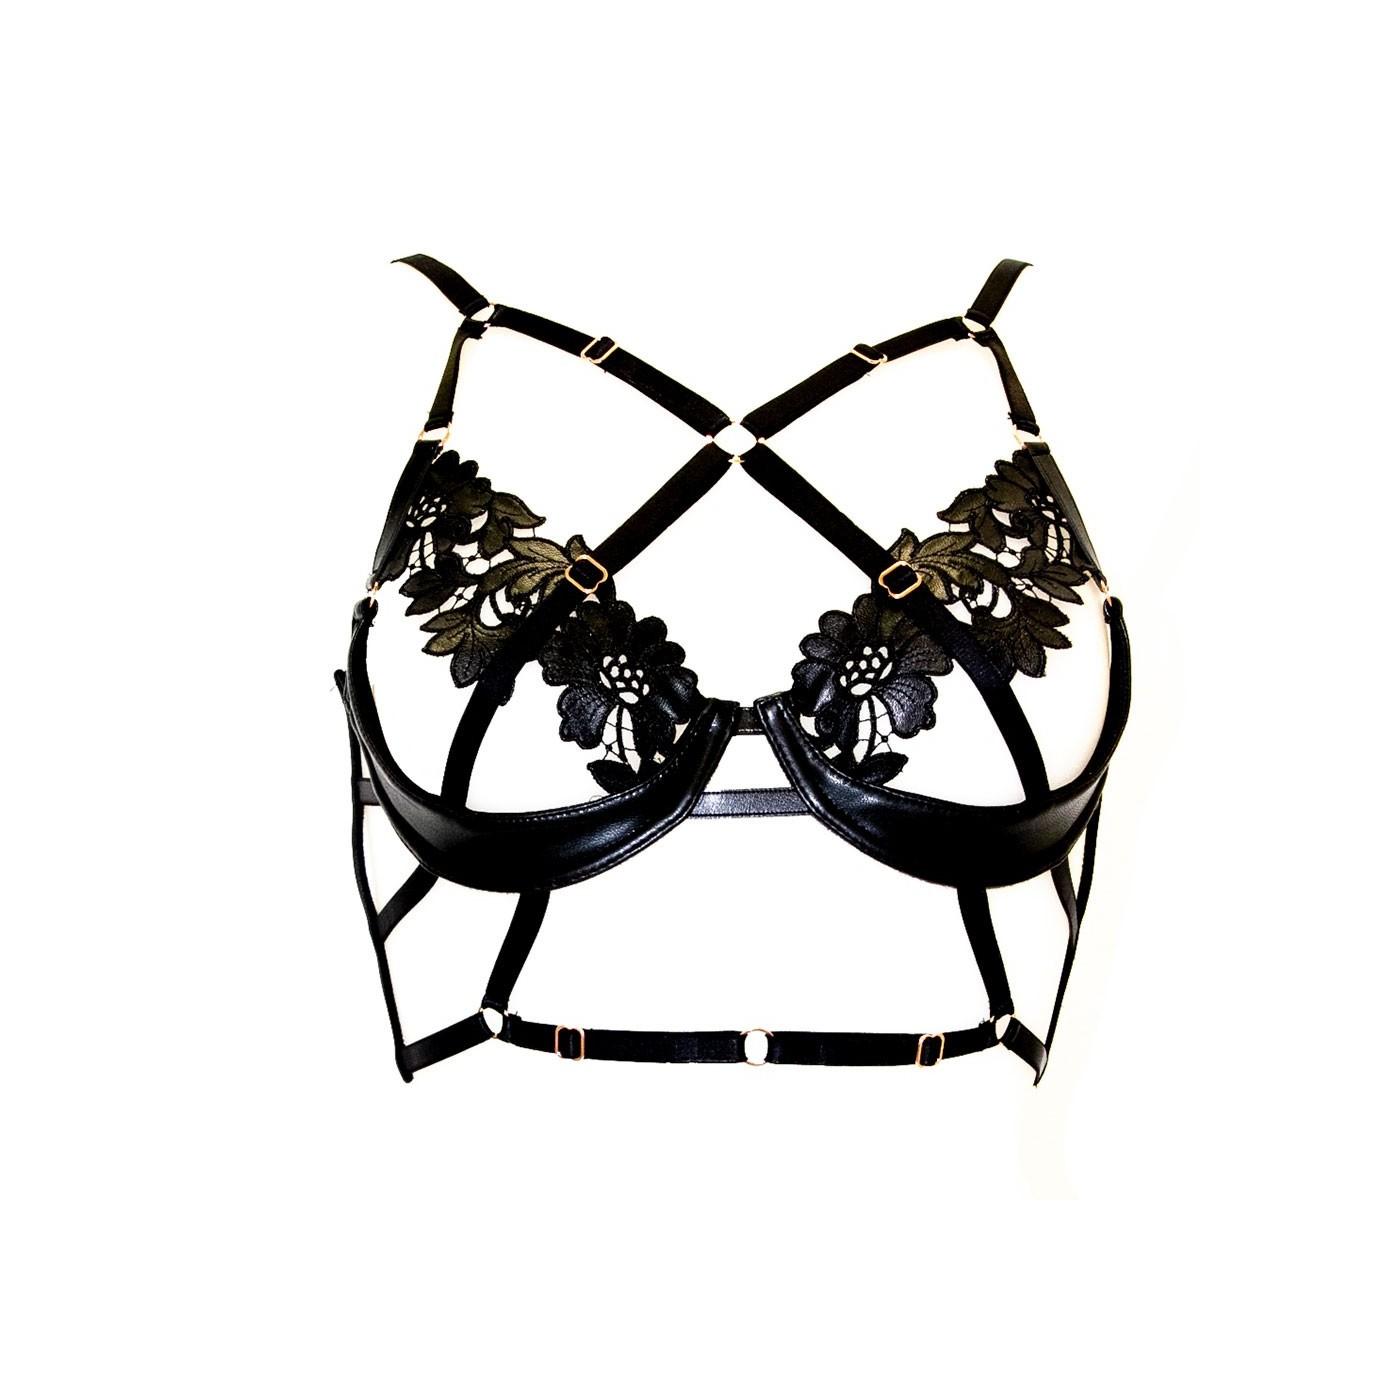 Nala Bra - Impudique Luxury Lingerie by Charlotte Catanzaro